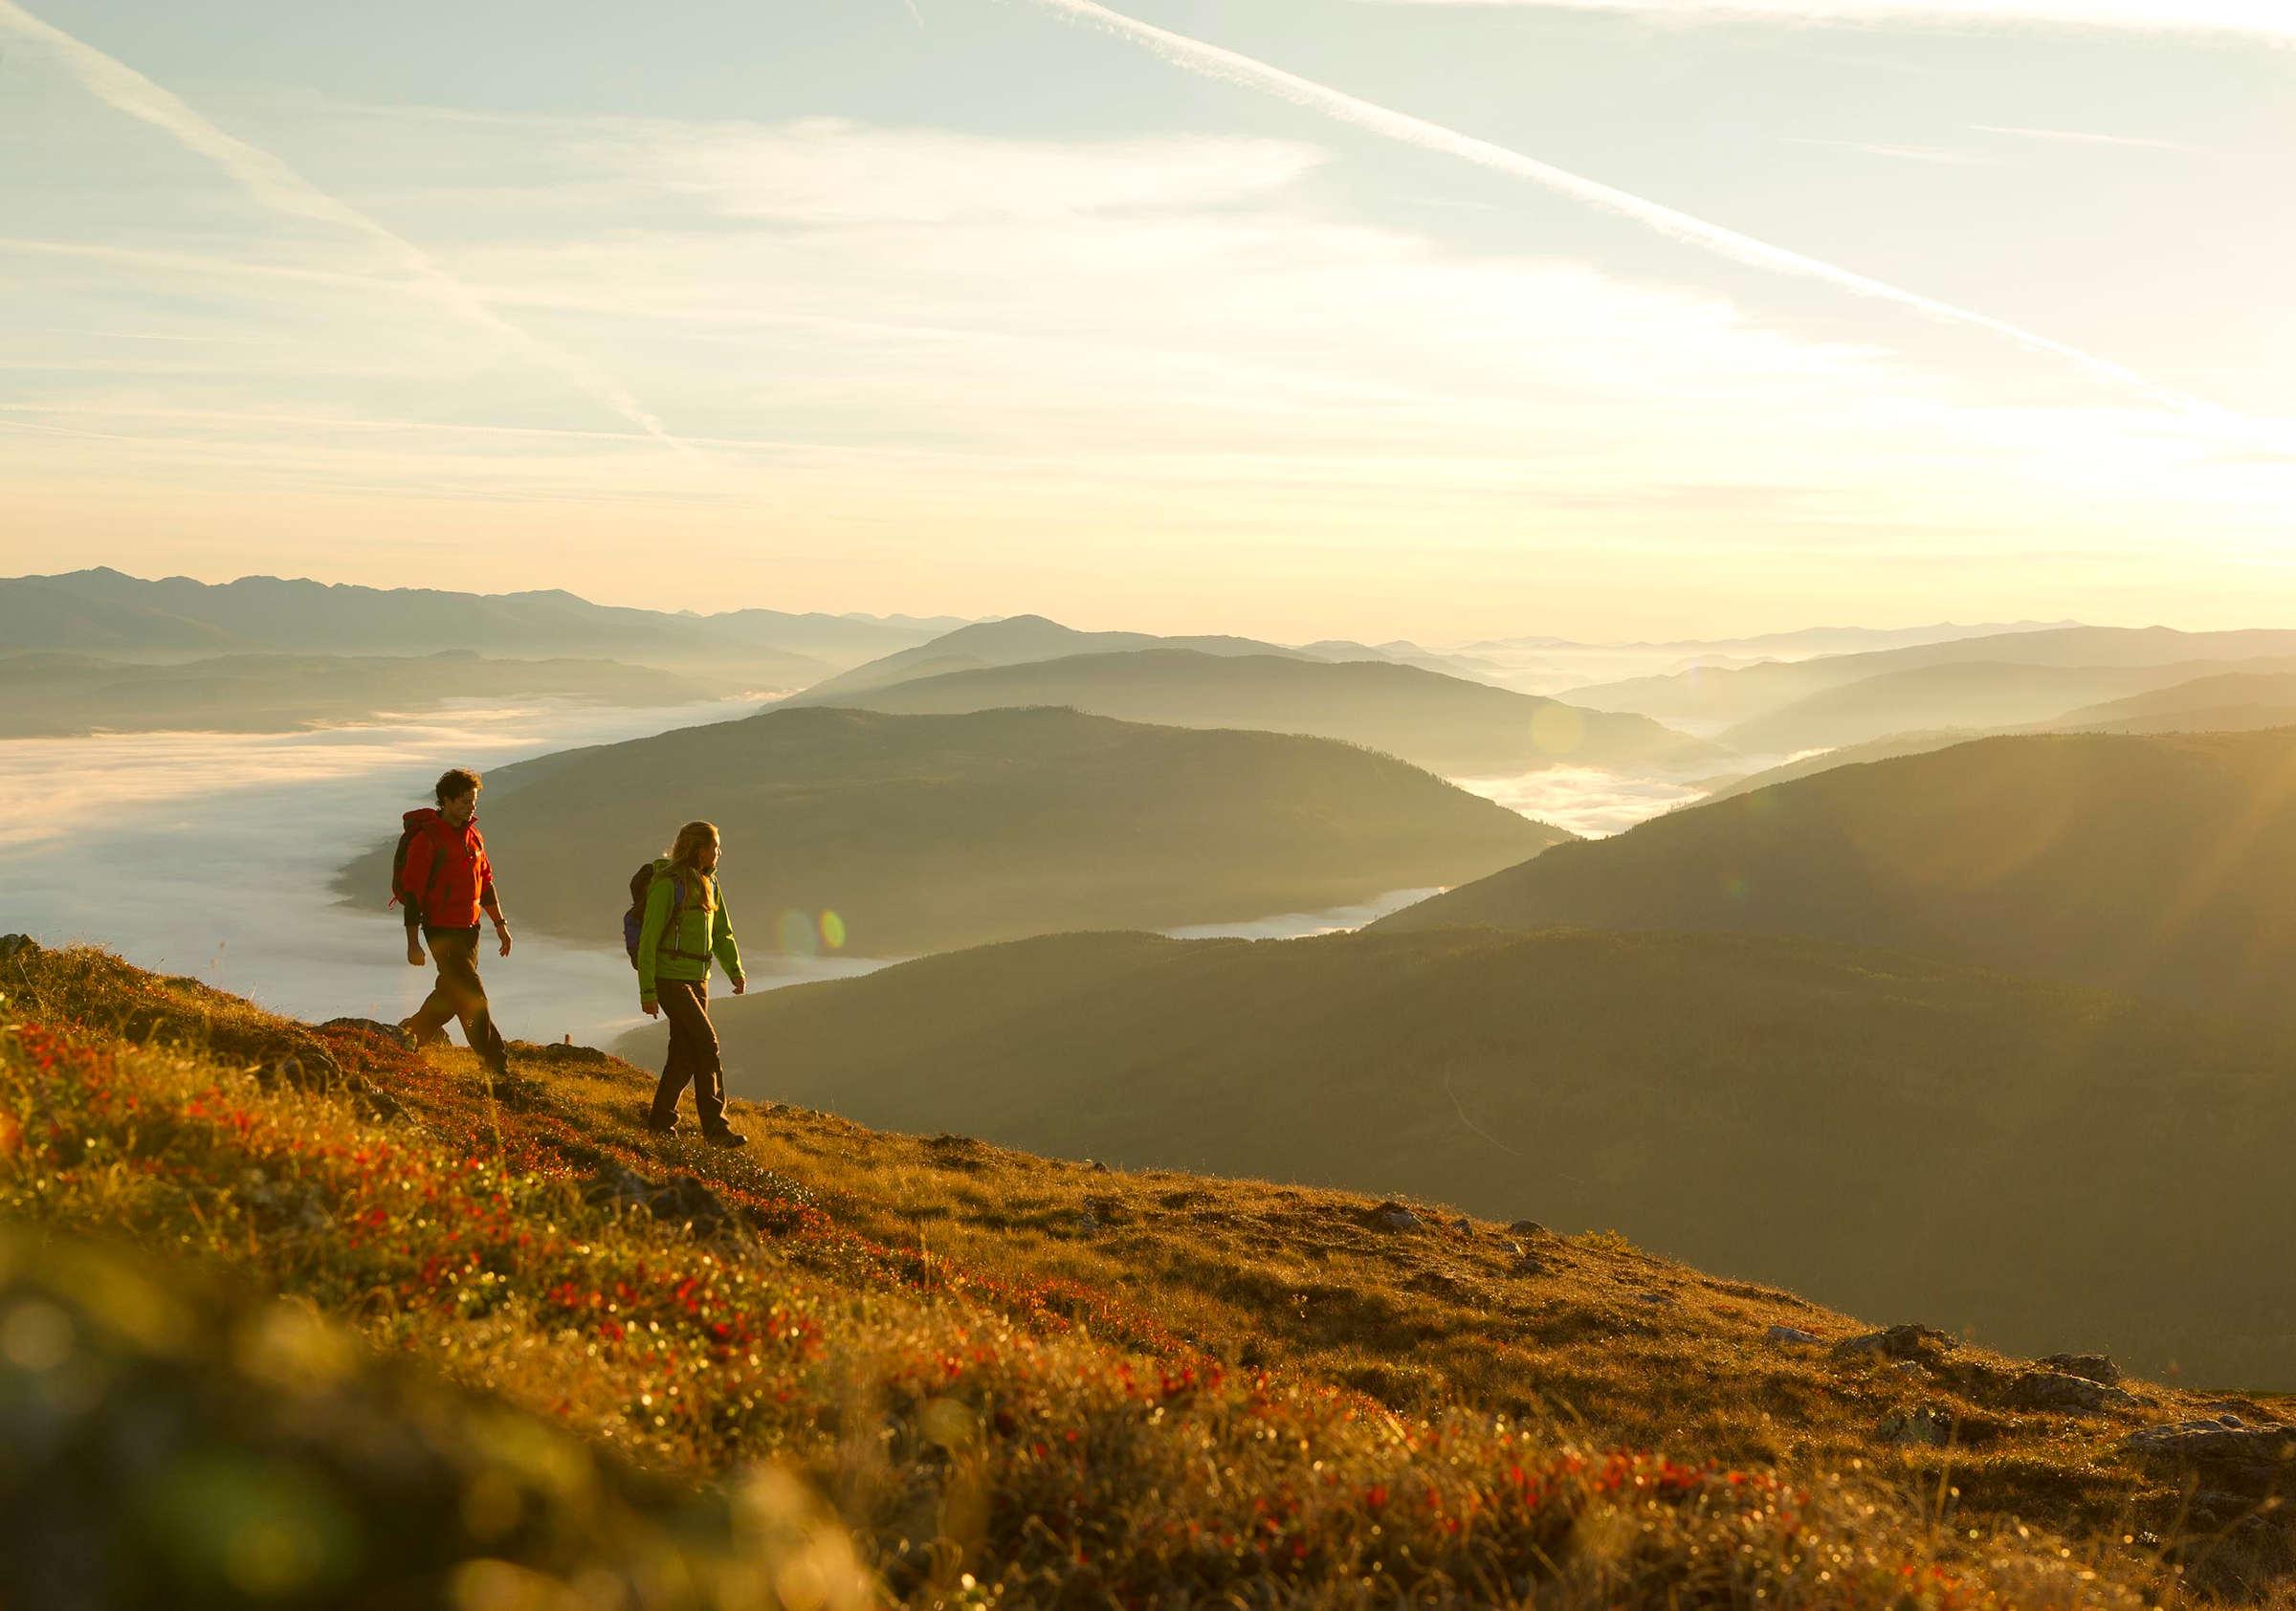 Alpe-Adria-Trail: dal Großglockner fino al mare uno splendido trekking transfrontaliero